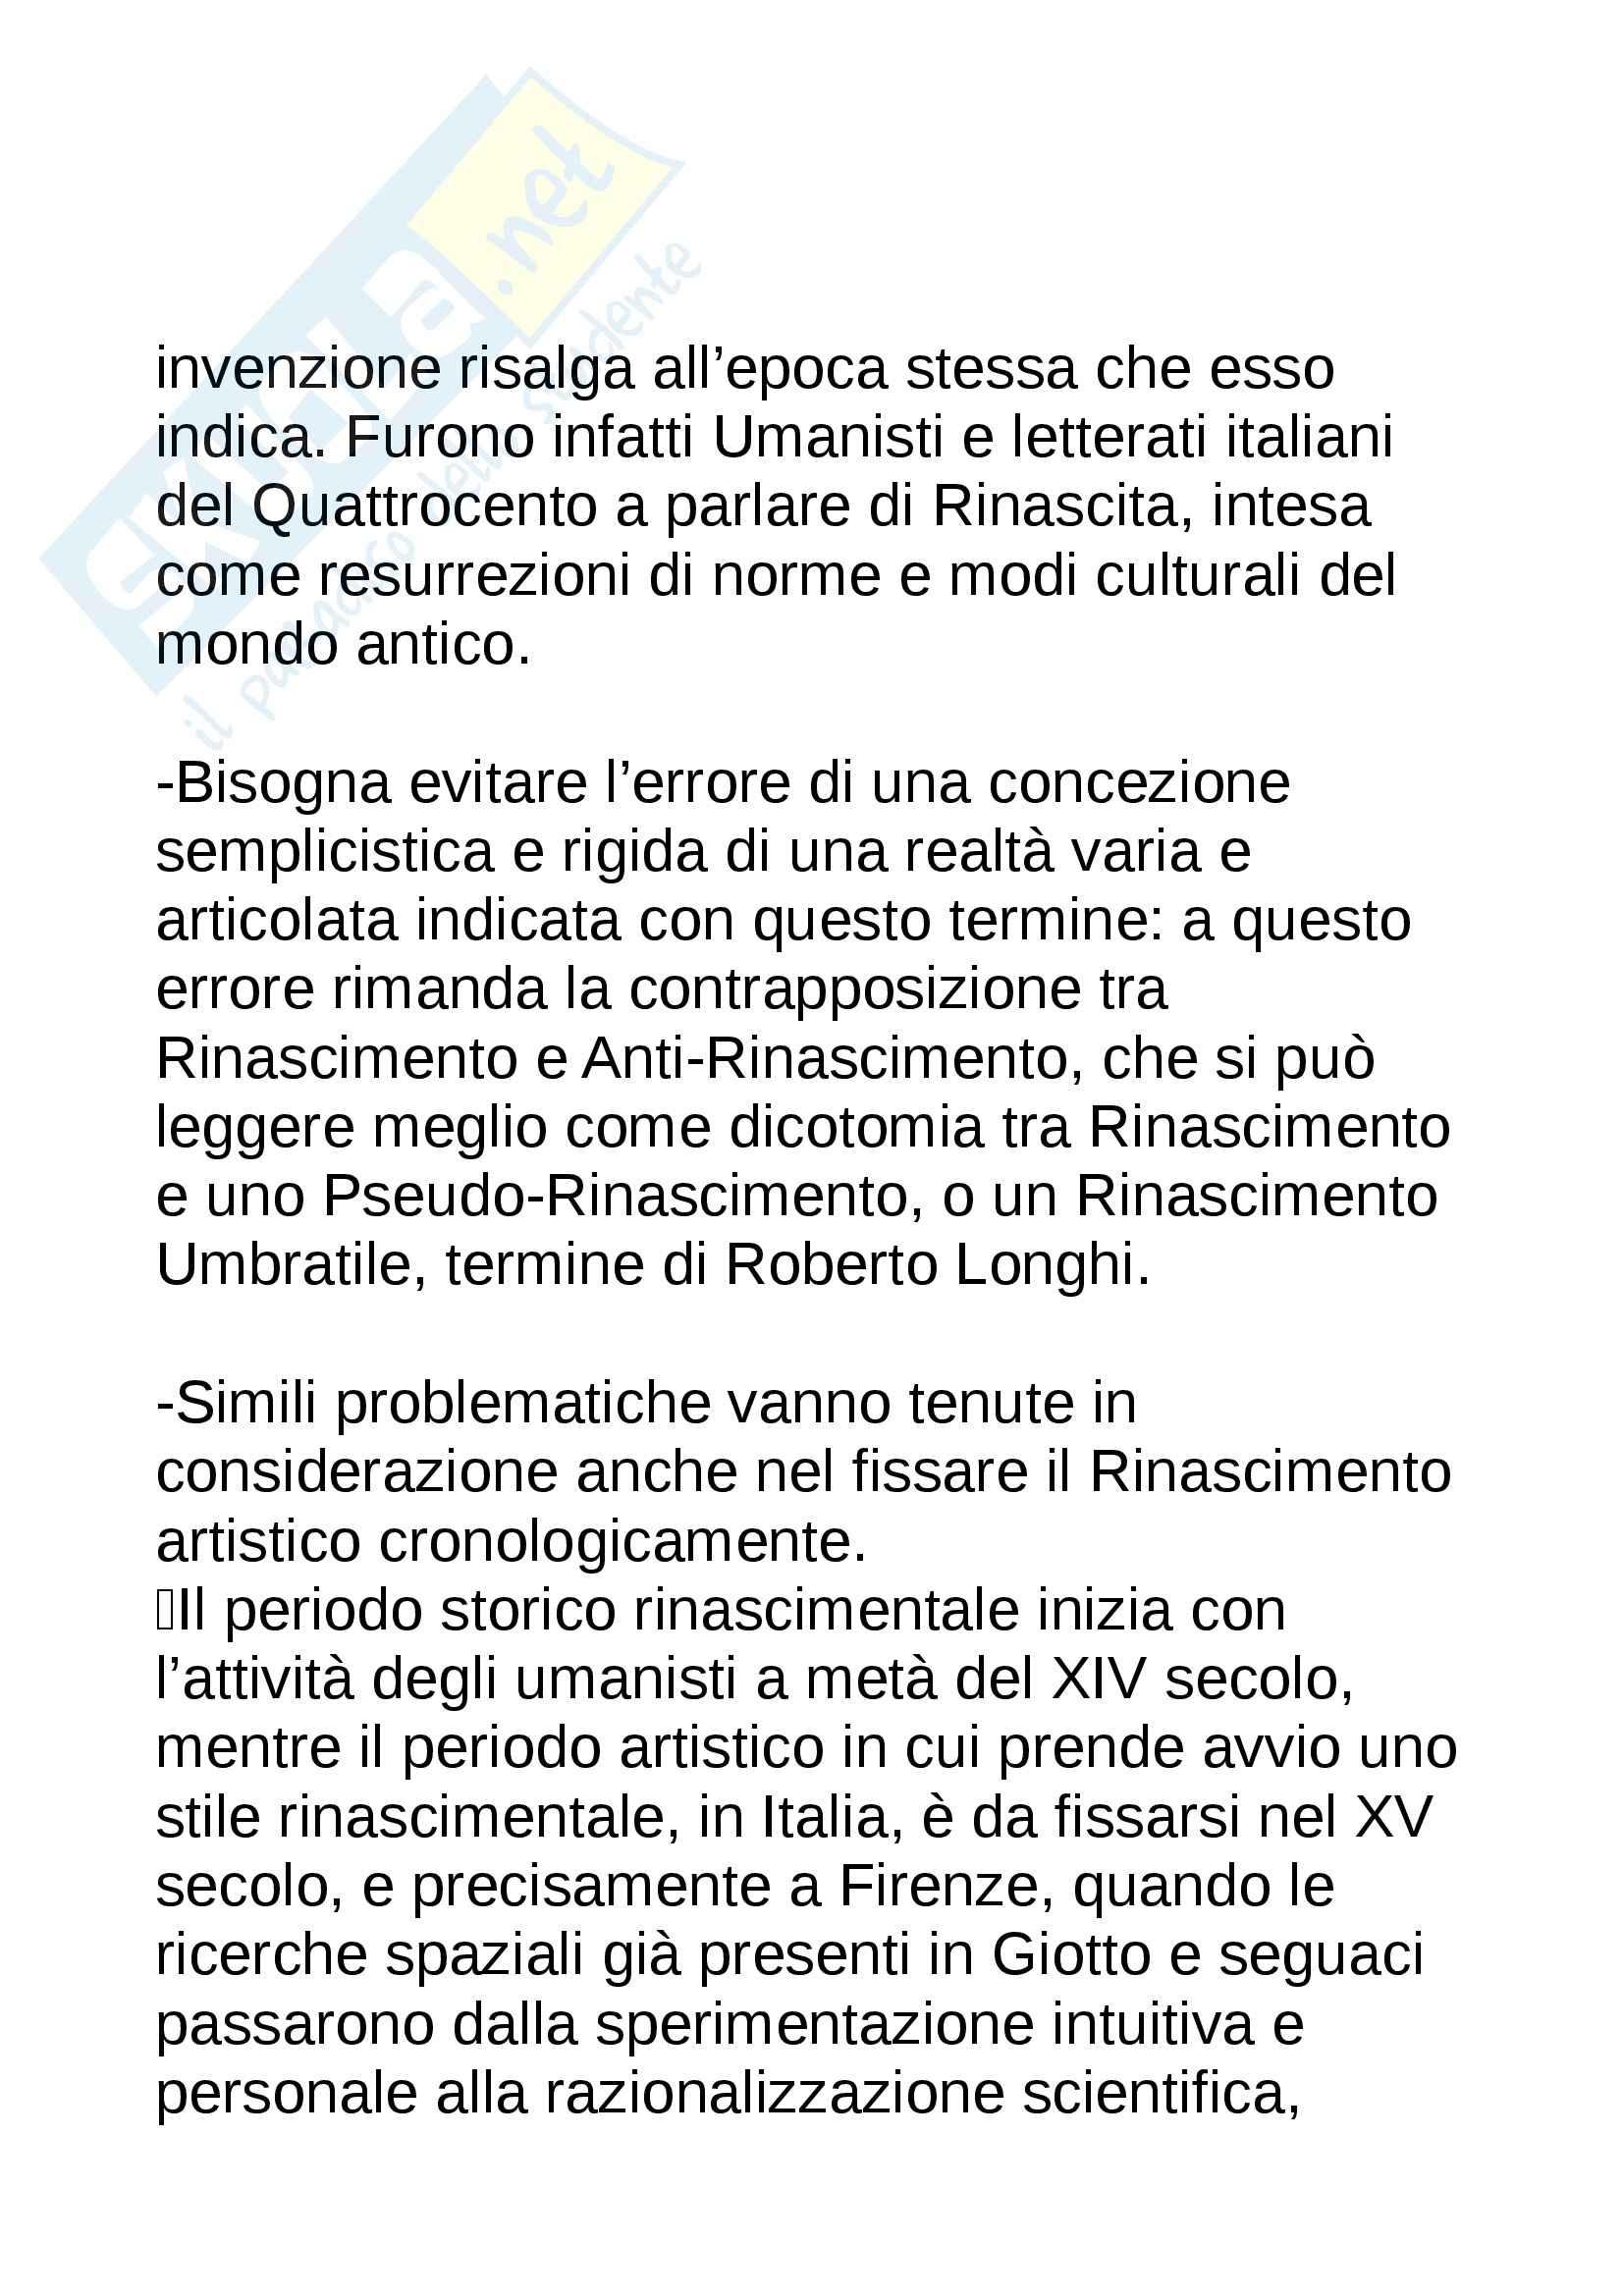 Riassunto esame Storia dell'Arte Moderna, prof. Benati, libro consigliato Rinascimento e Pseudorinascimento, Zeri